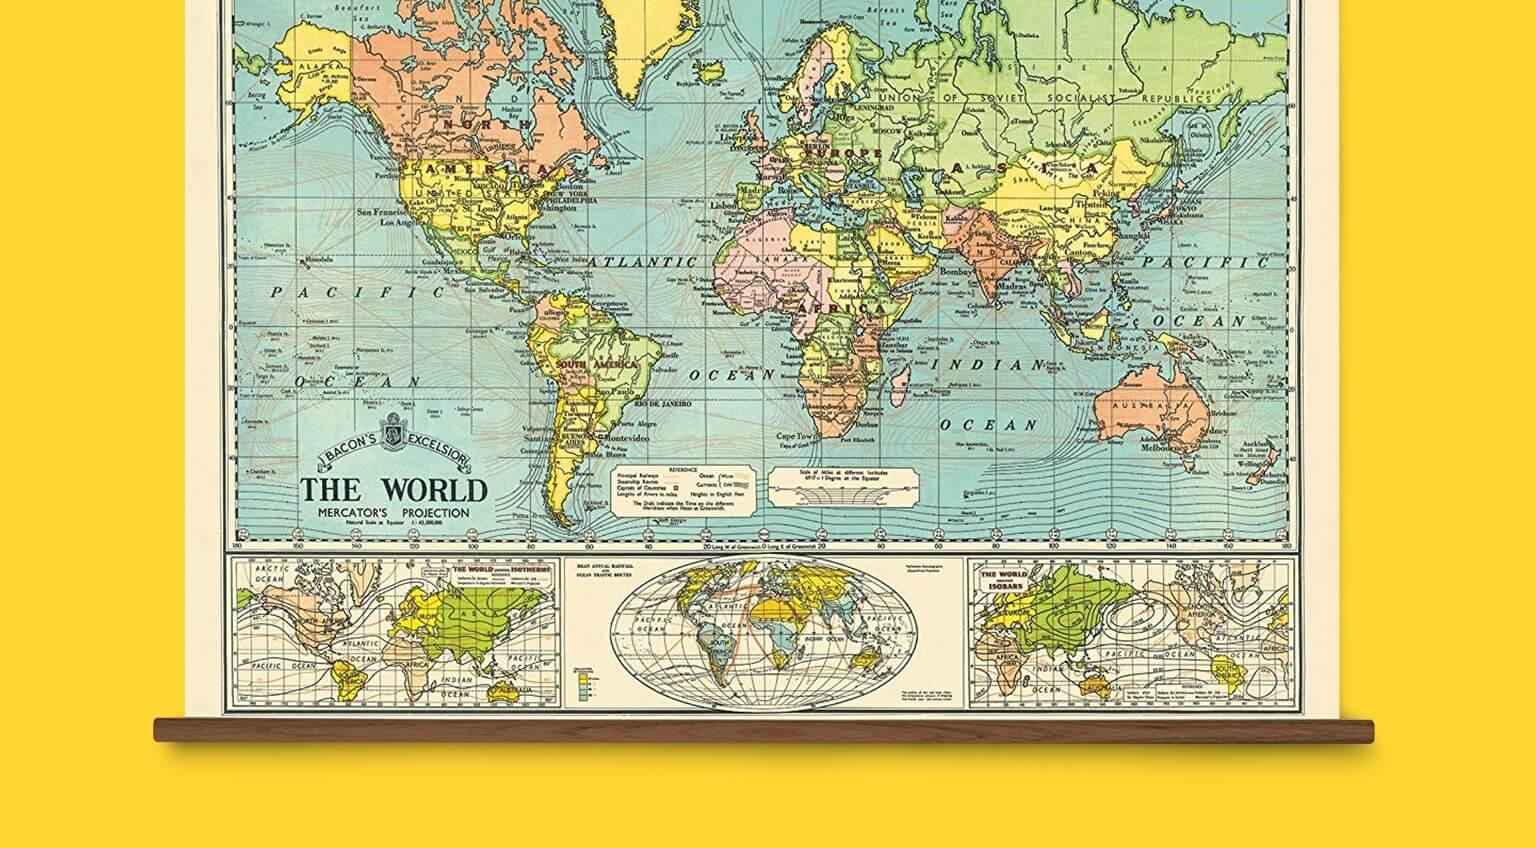 4004f6d5c50 Cavallini & Co. Papers World Vintage School Chart on Sale | Valet.